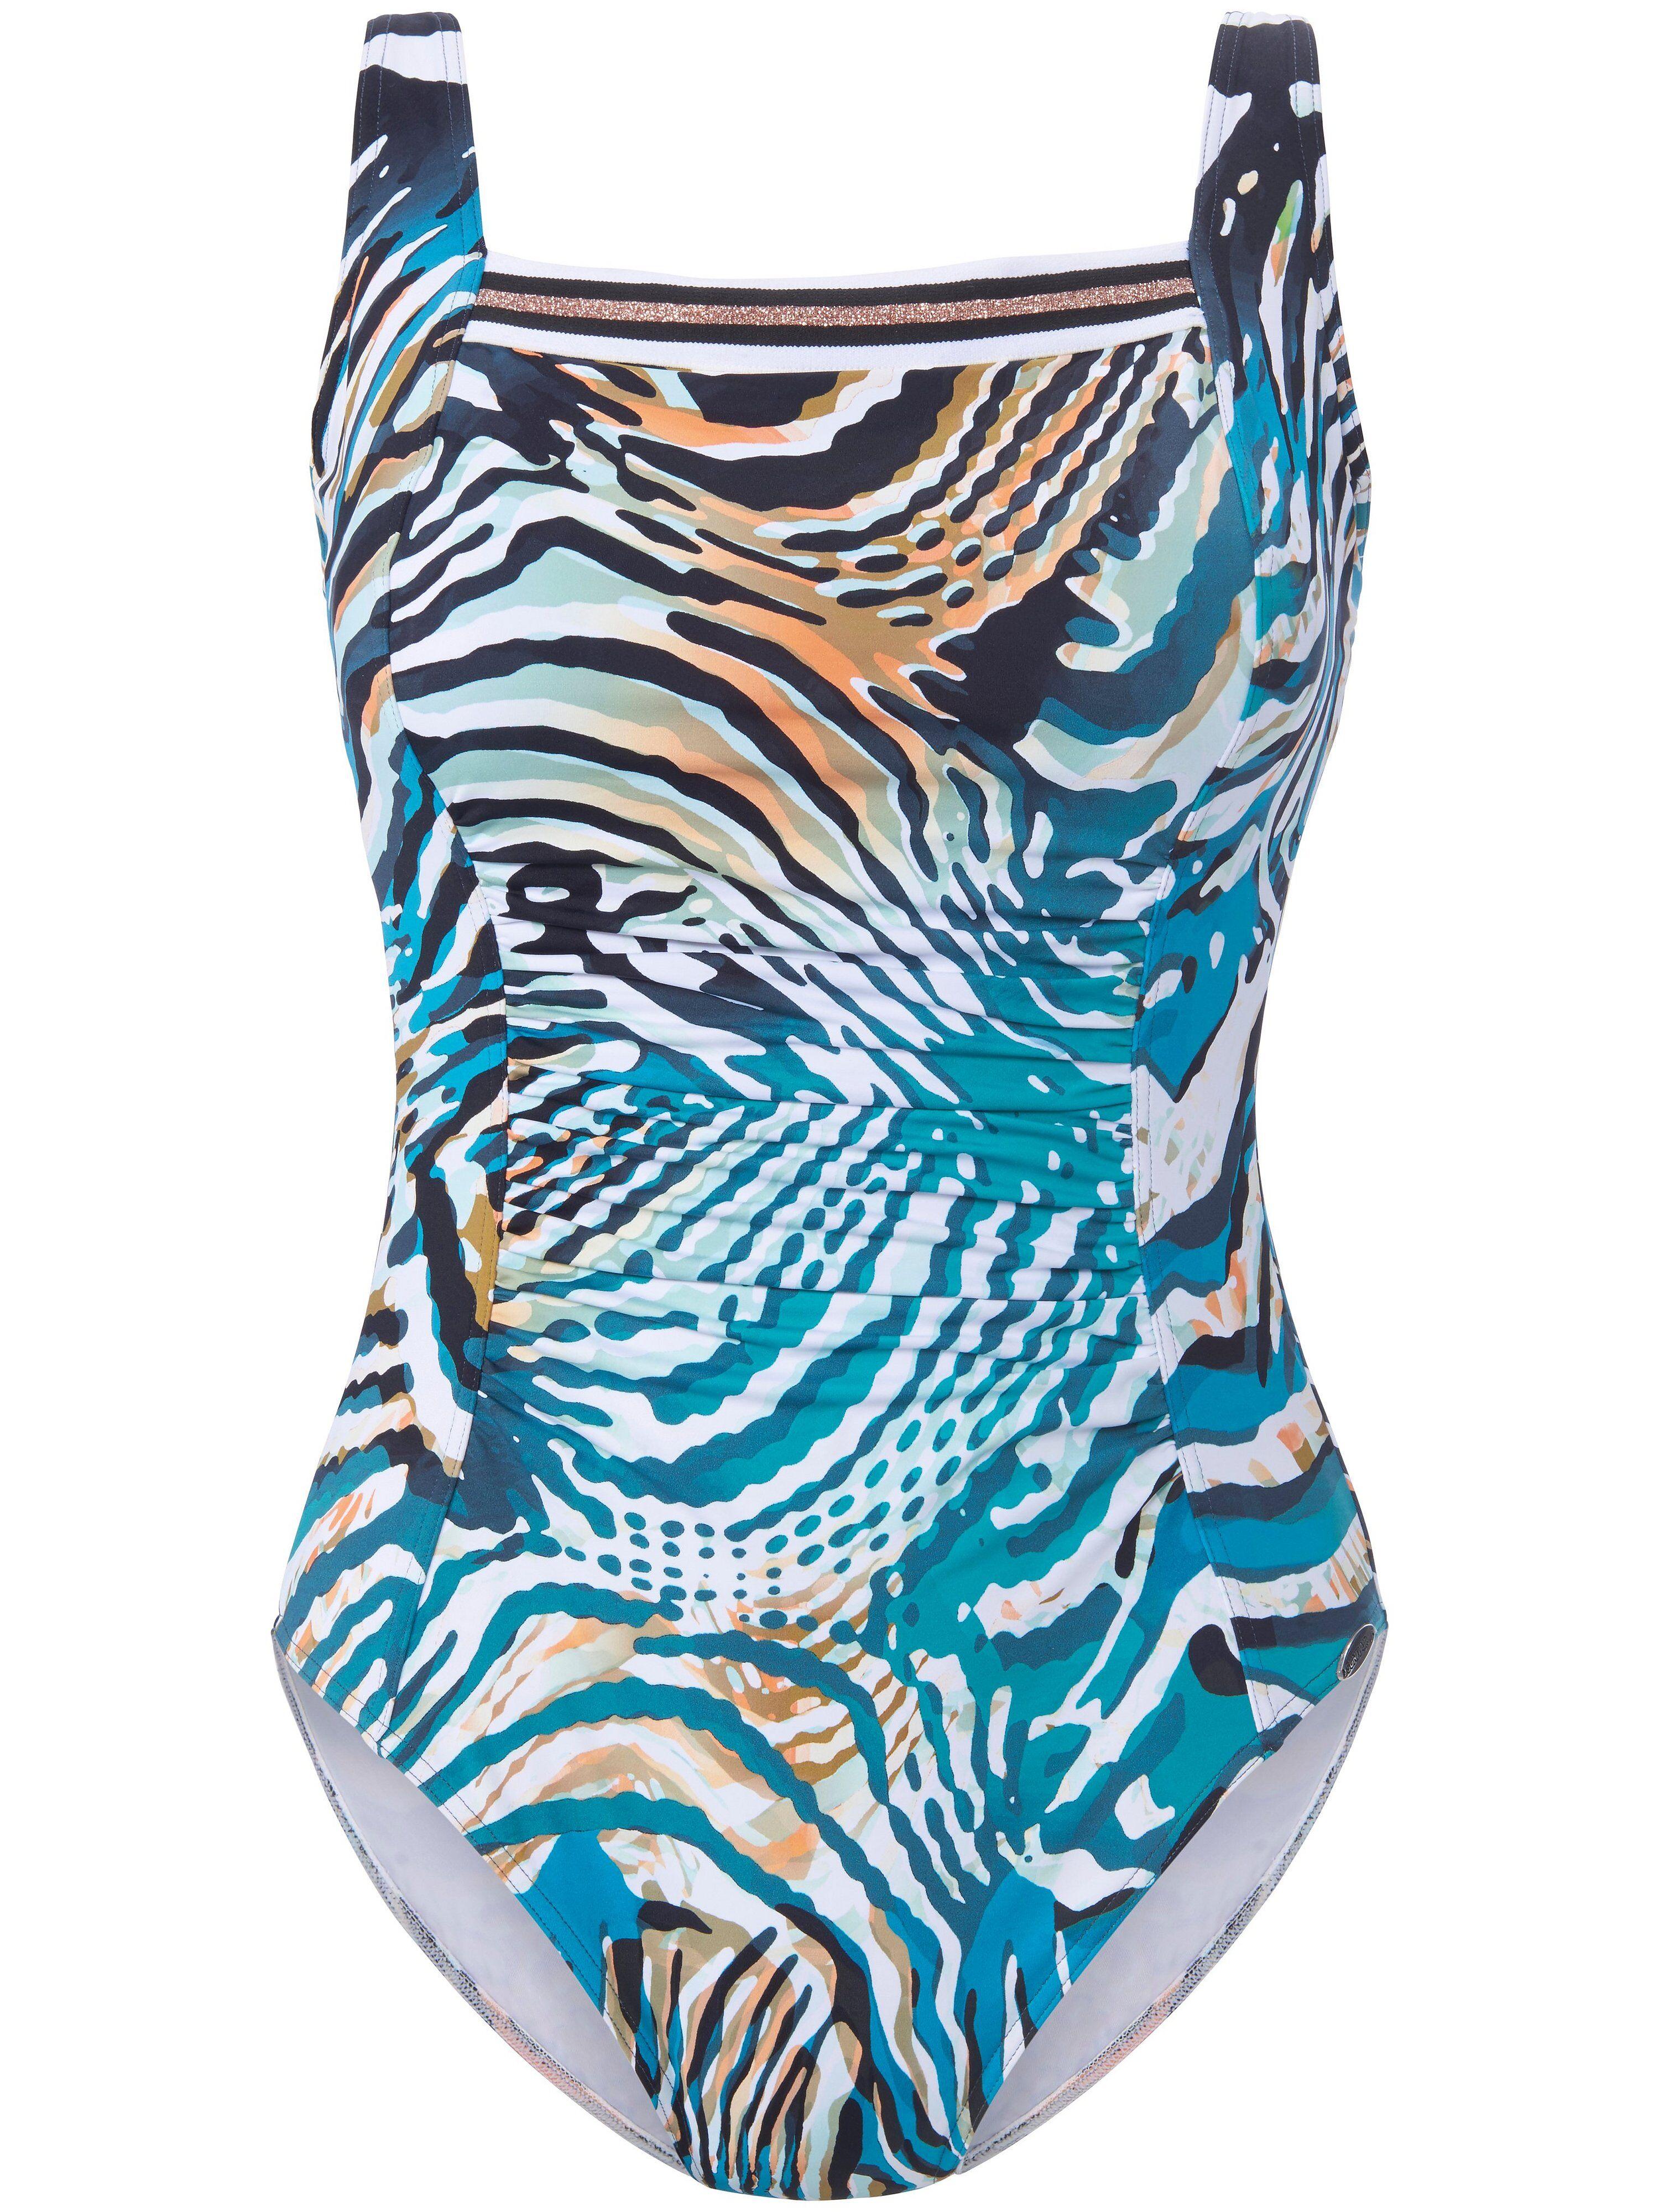 Sunflair Le maillot bain  Sunflair turquoise  - Femme - 40